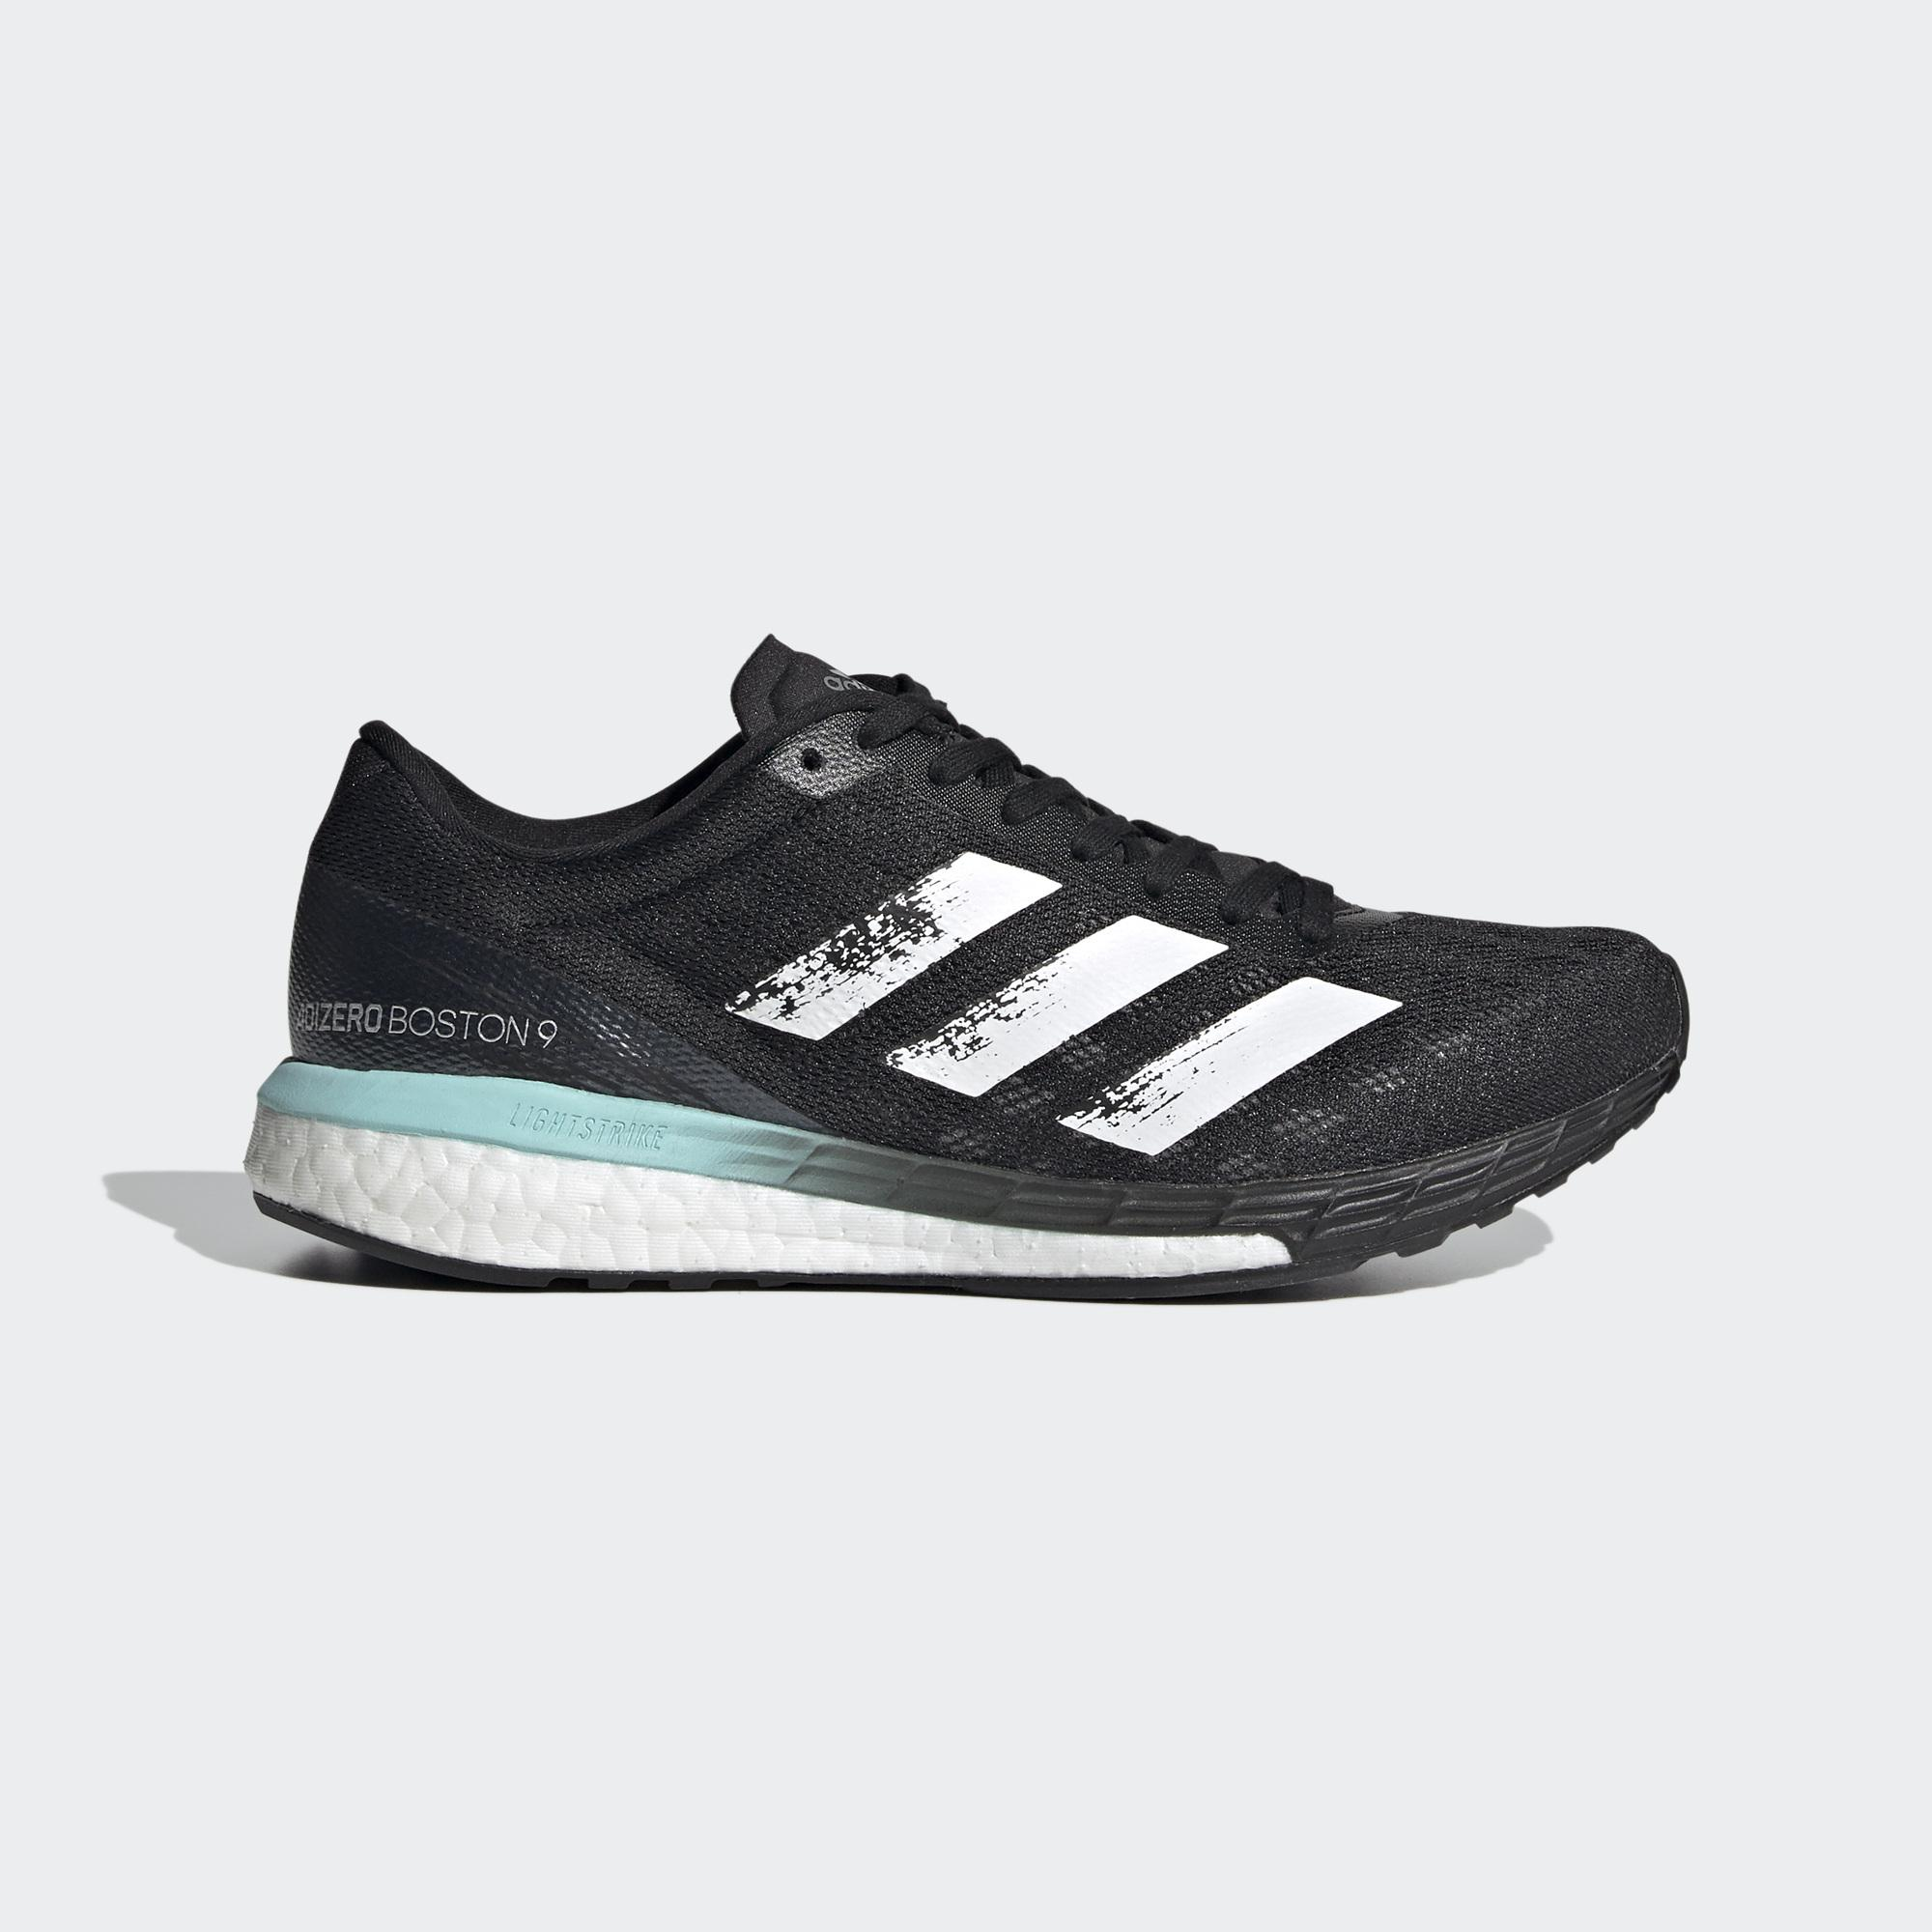 Adizero Boston 9 跑鞋